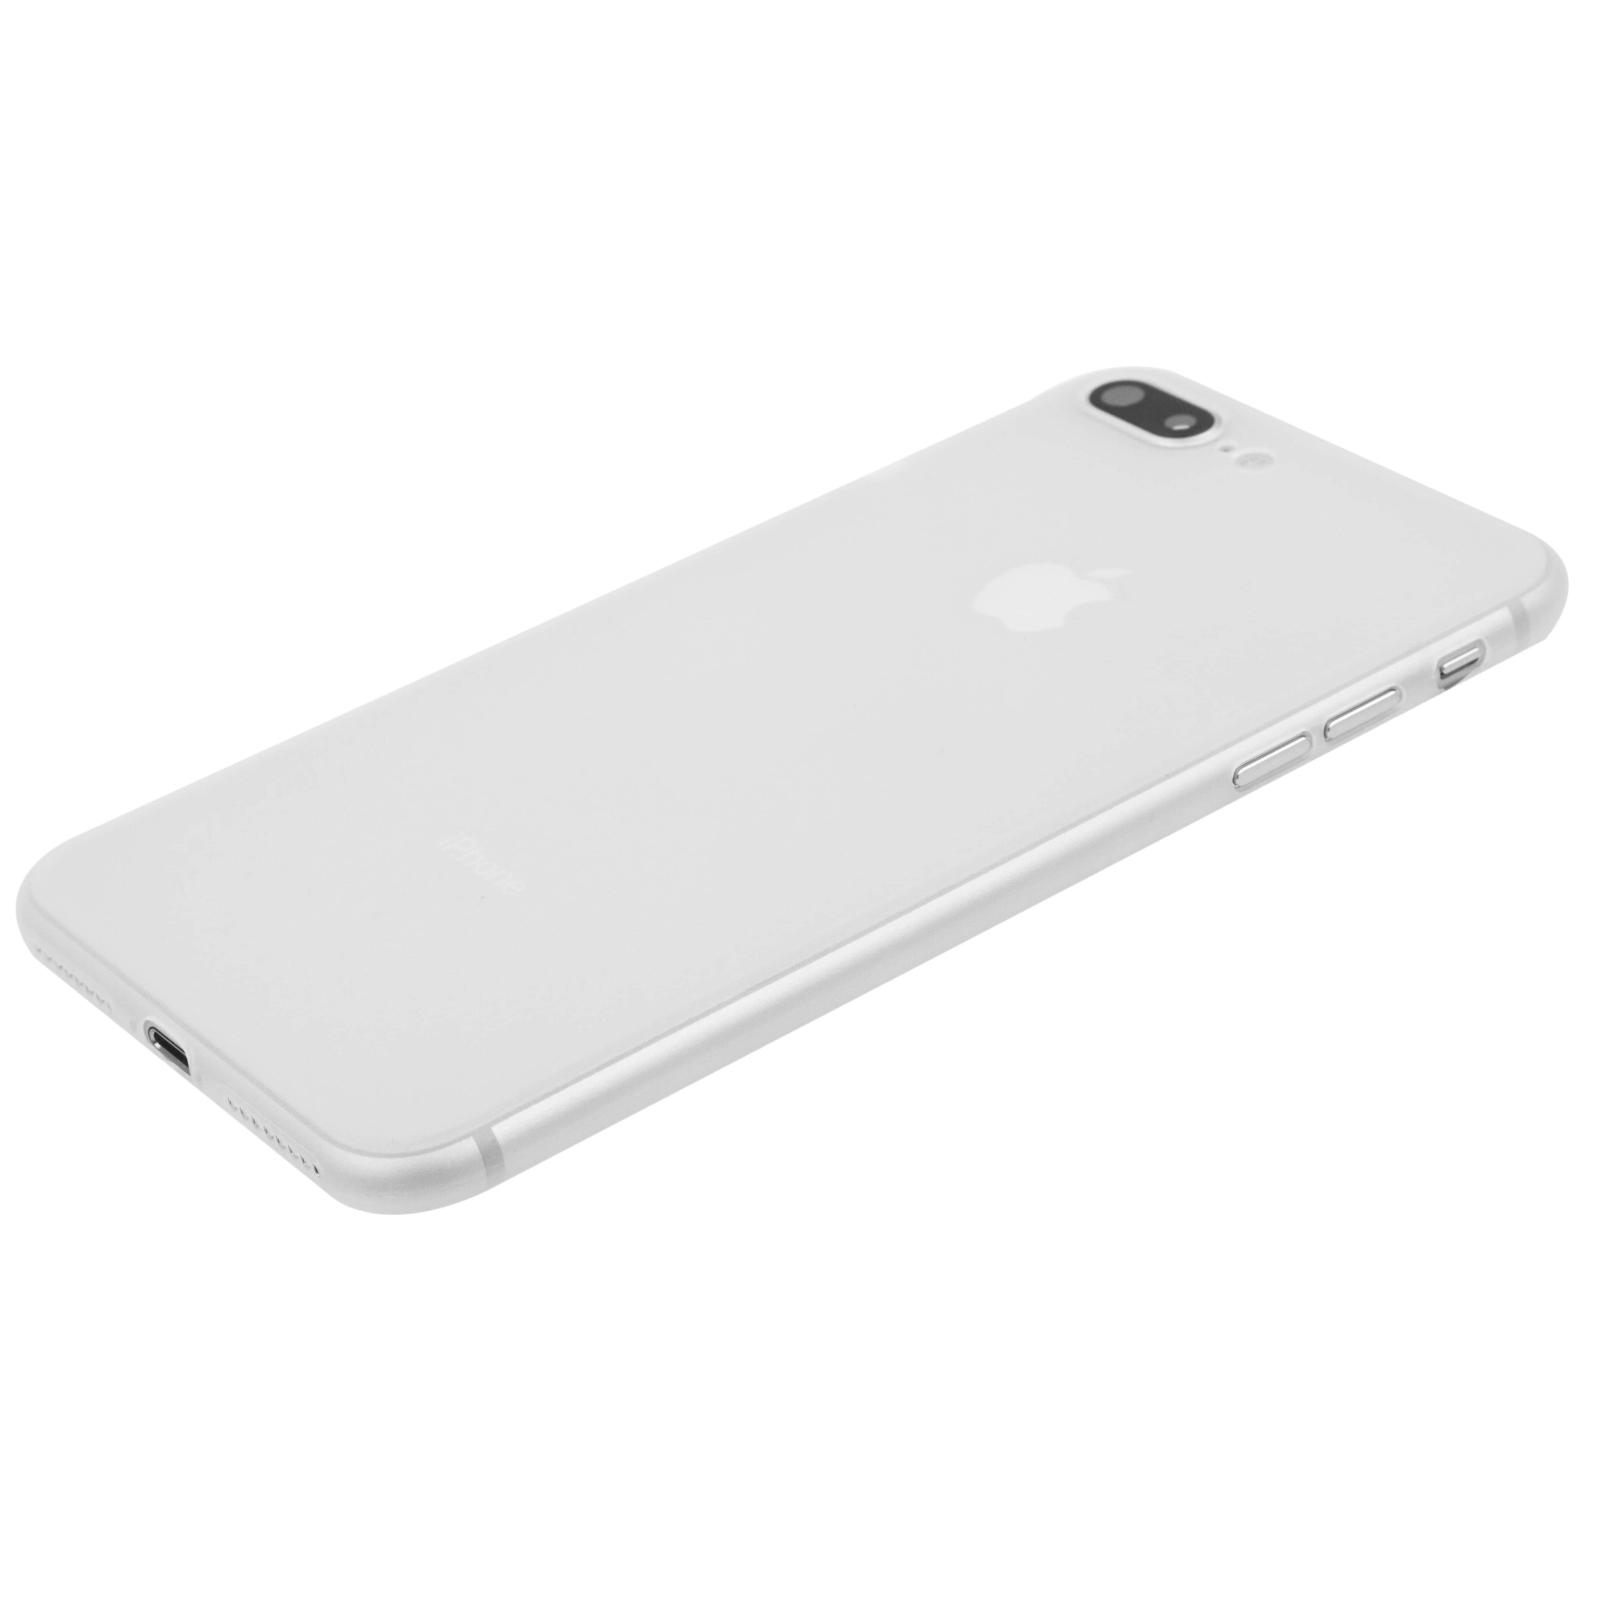 Чехол для моб. телефона MakeFuture Ice Case (PP) Apple iPhone 8 Plus White (MCI-AI8PWH) изображение 2